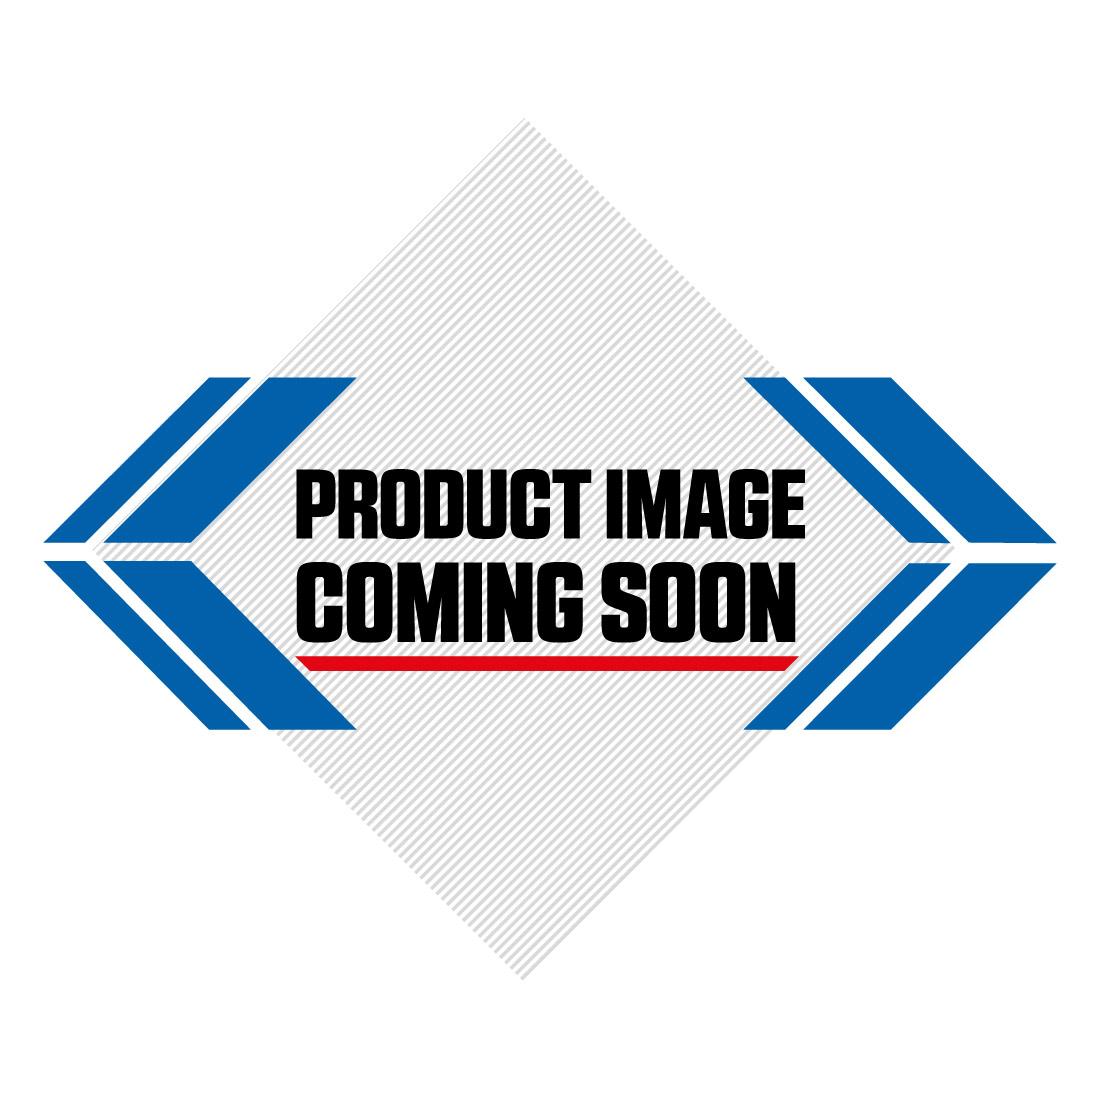 Kawasaki Restyled Plastic Kit KX 85 (2010) OEM Factory Image-4>